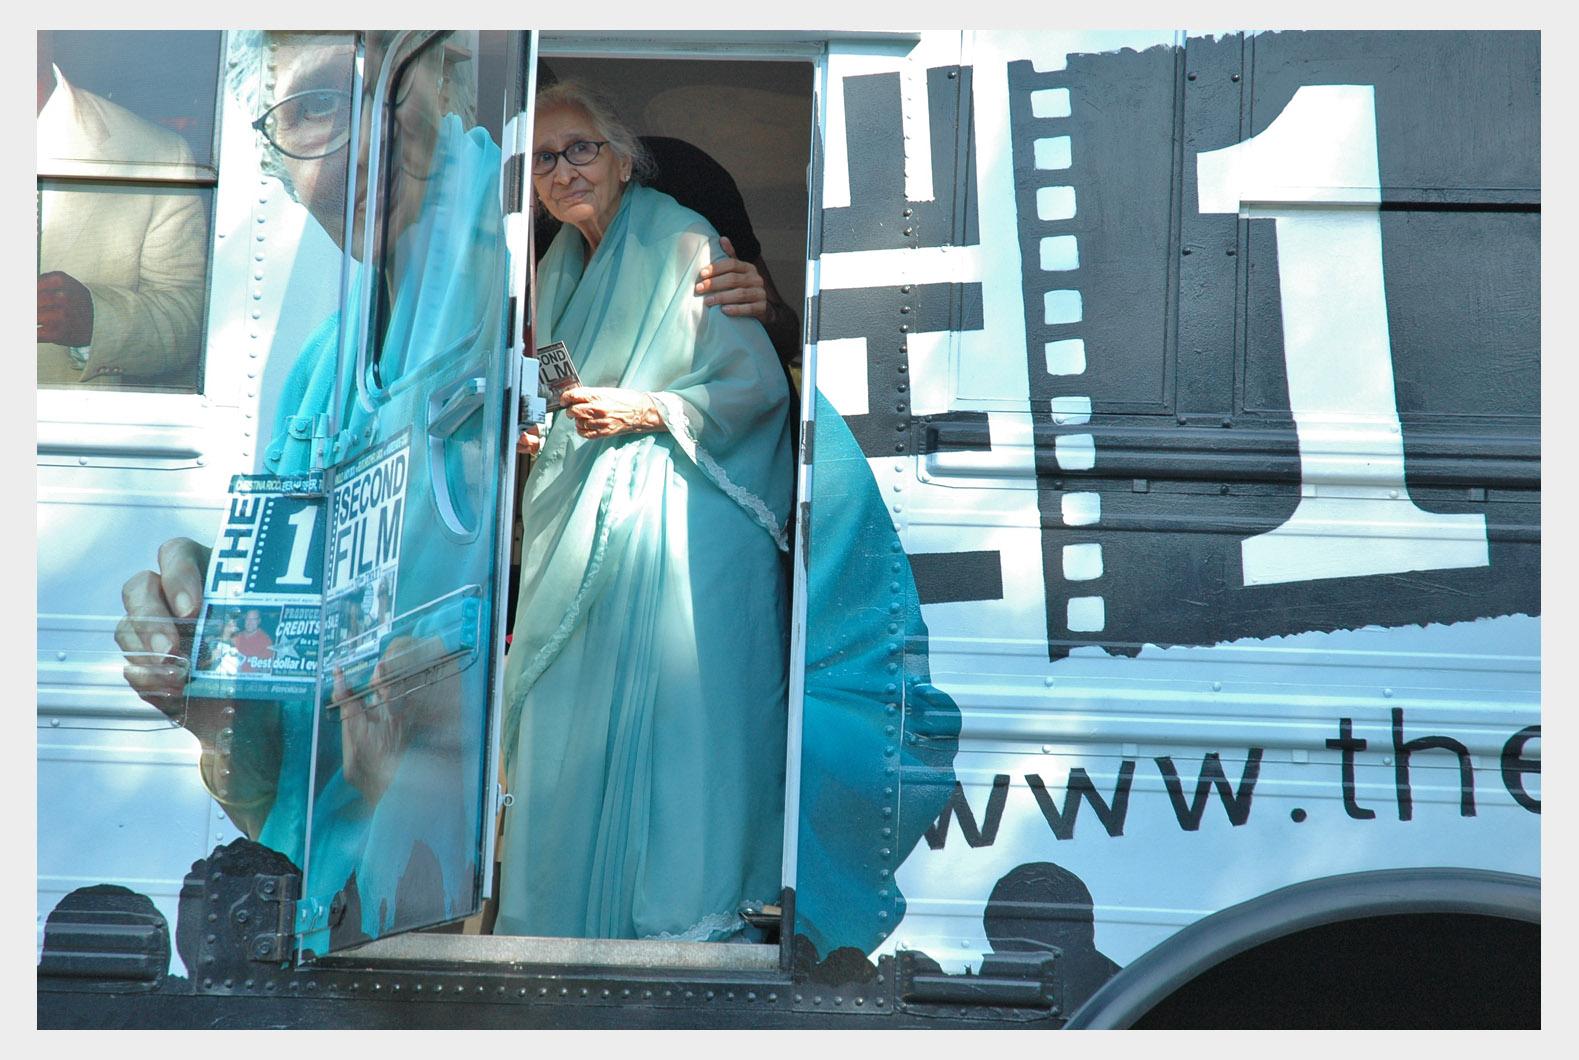 grandmother_bus.jpg